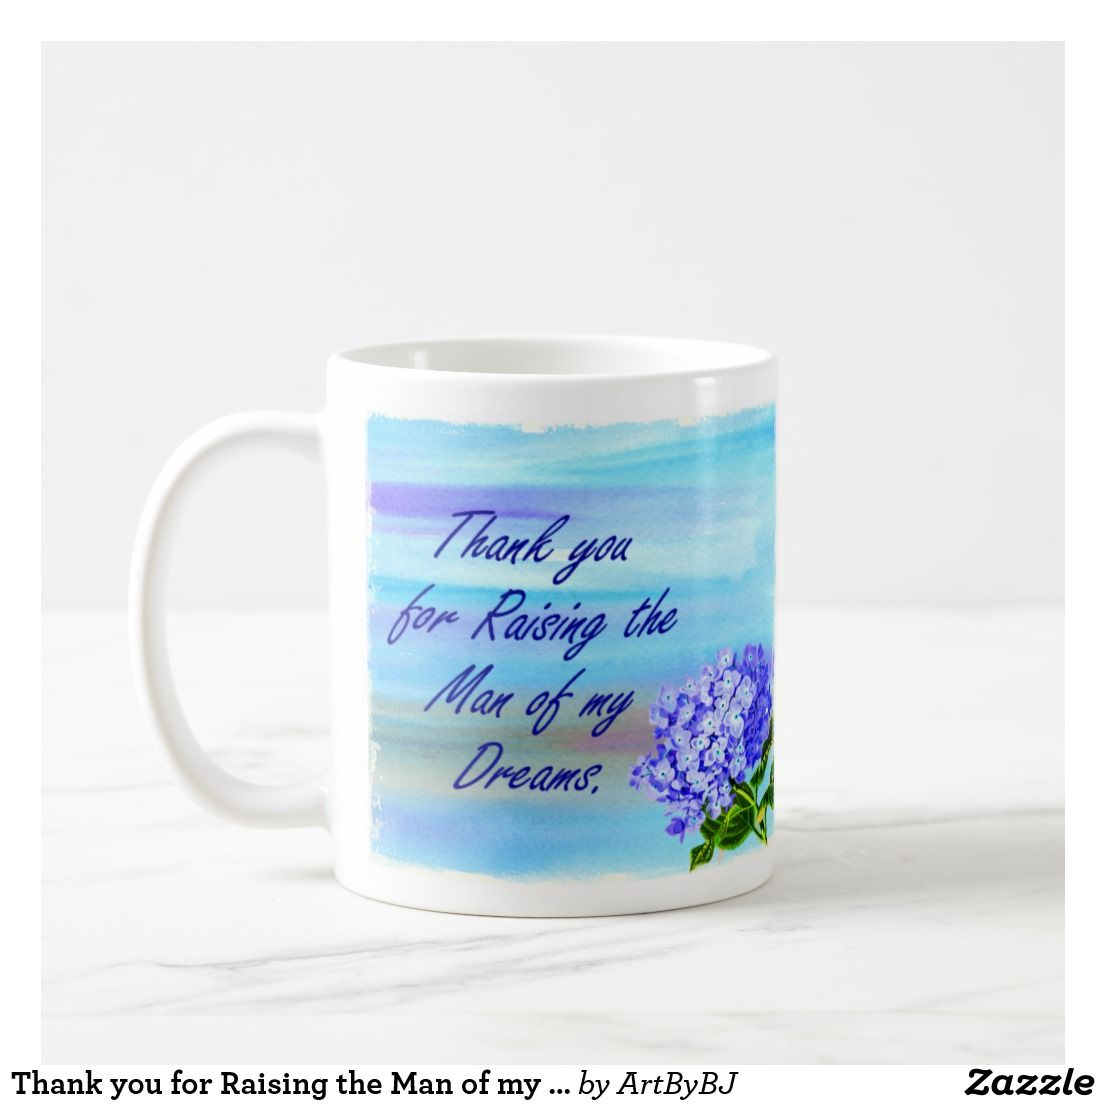 Thank You For Raising The Man Of My Dreams Coffee Mug Zazzle Com Mugs Coffee Mugs The Man